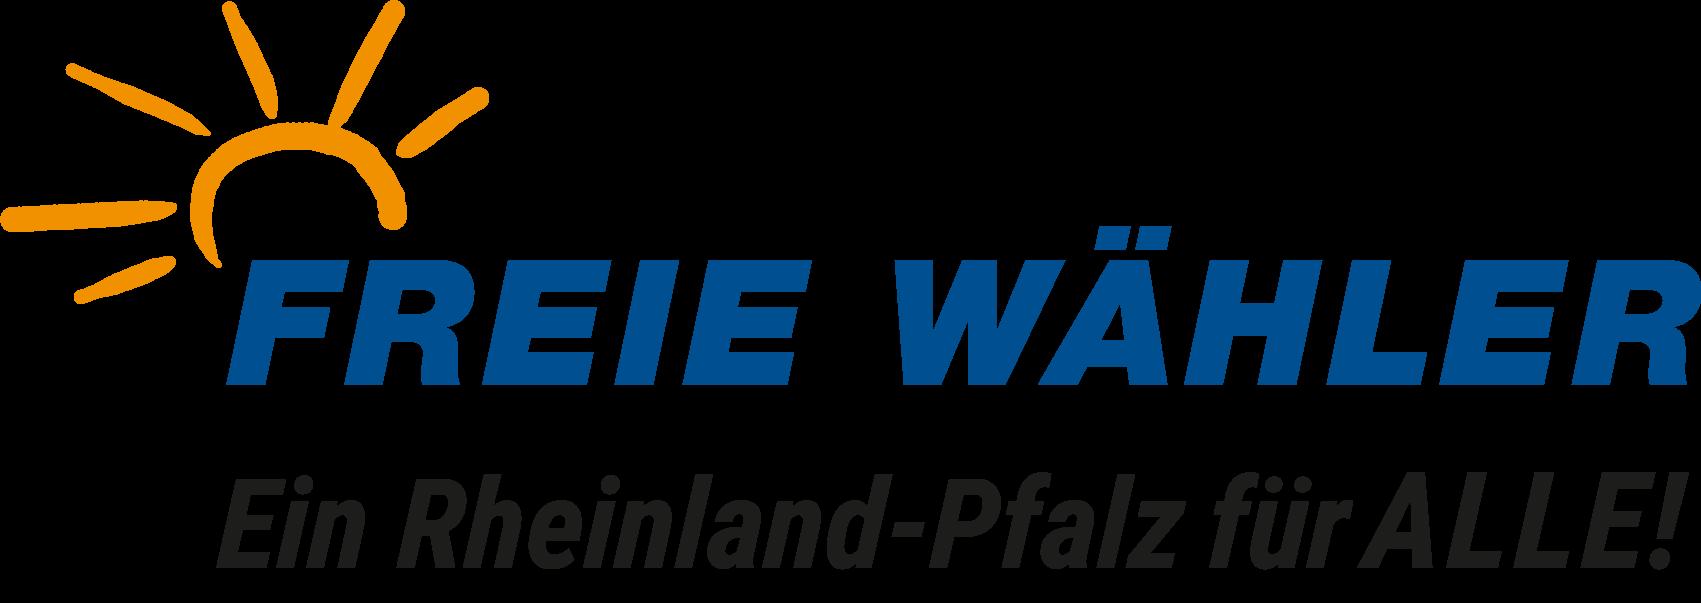 Lisa Jeckel FREIE WÄHLER Rheinland-Pfalz